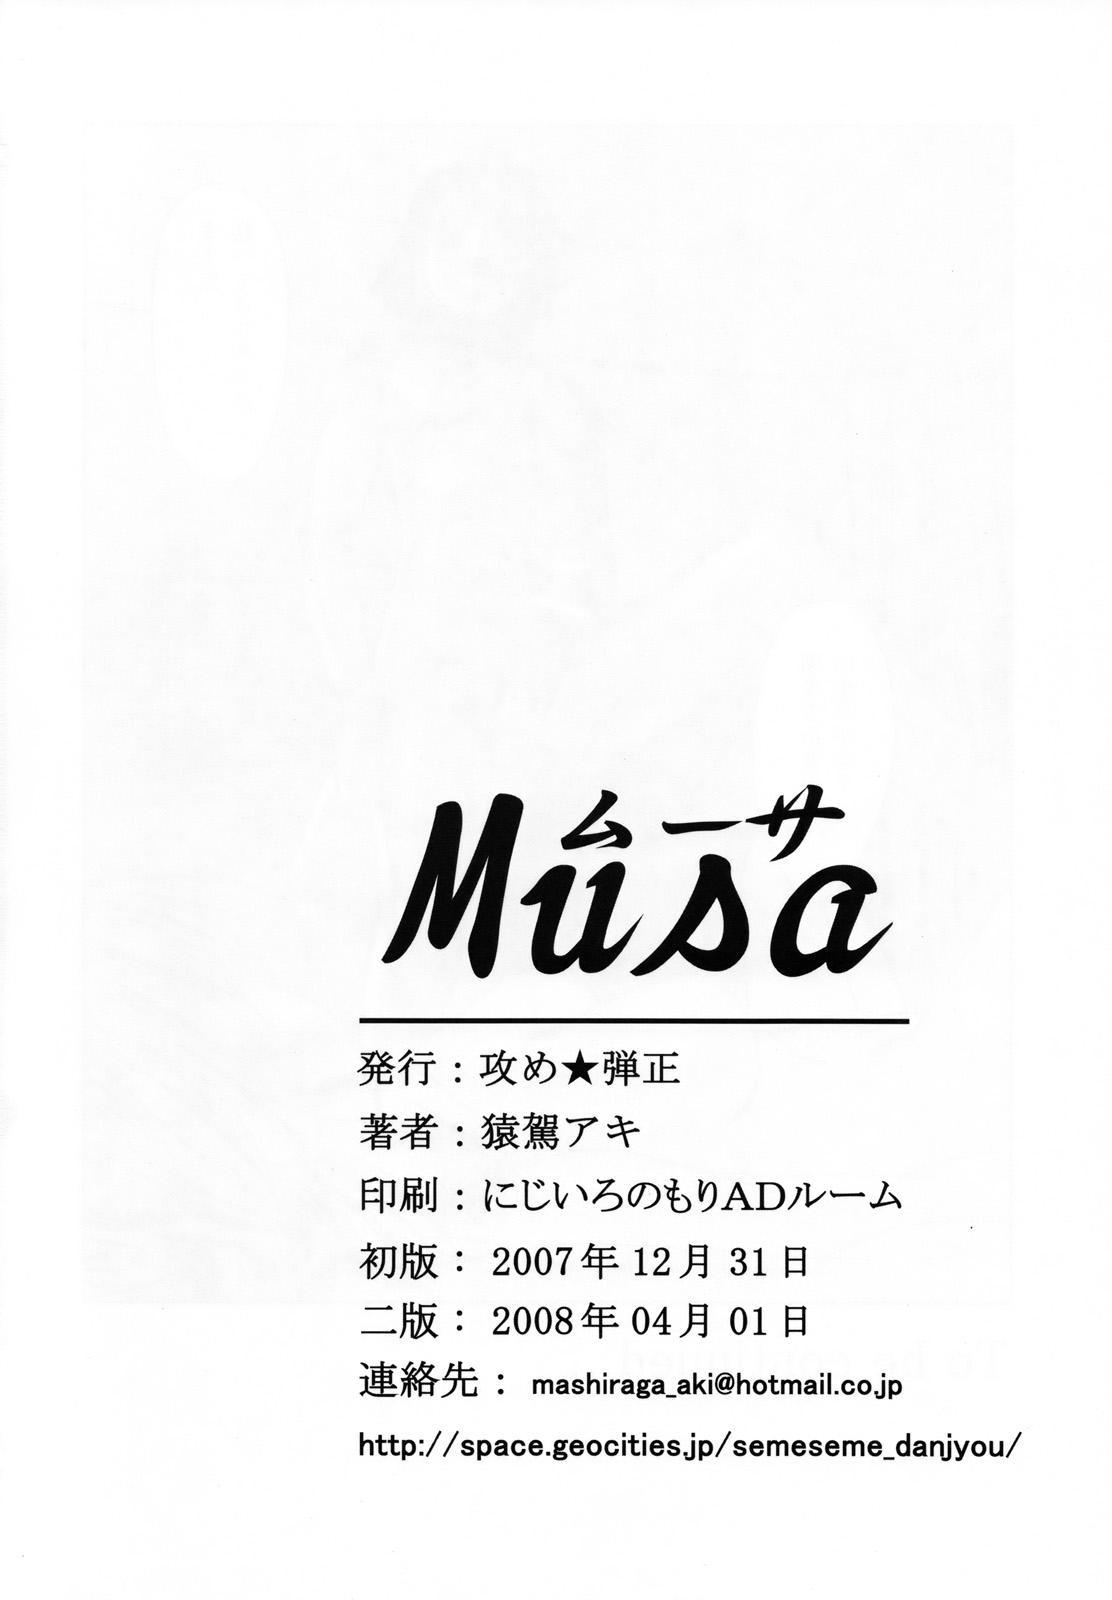 Musa 63